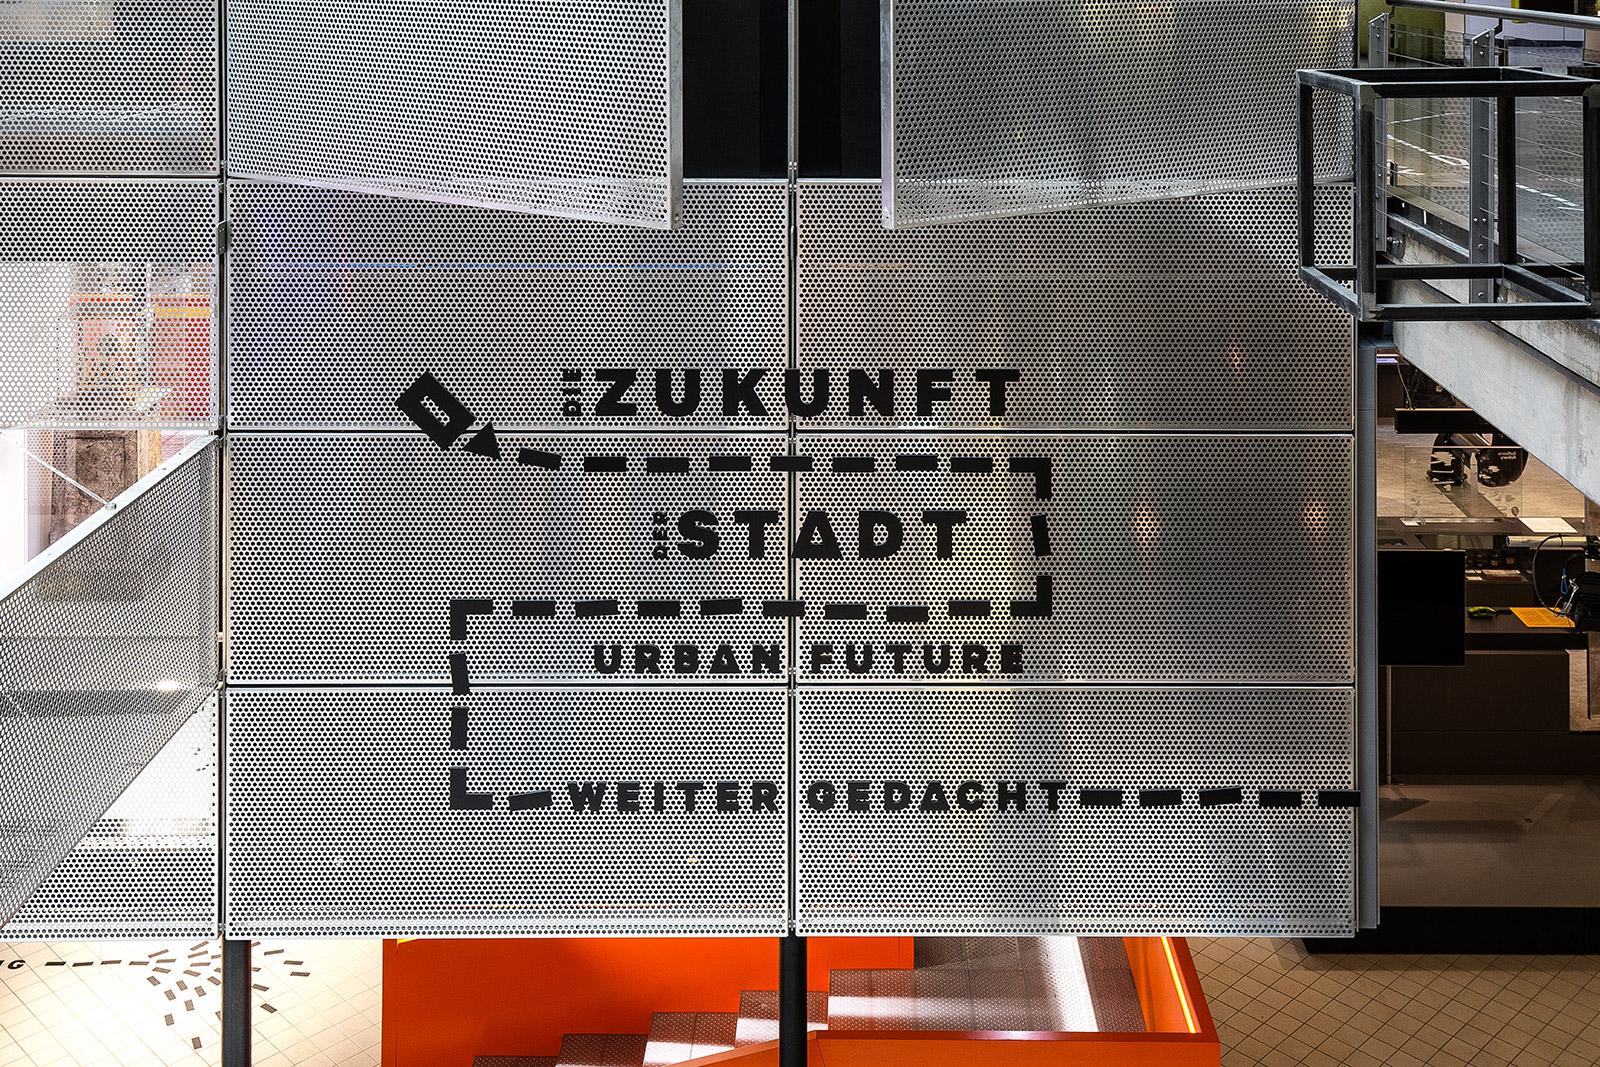 12_urbanfuture_fassade_web.jpg